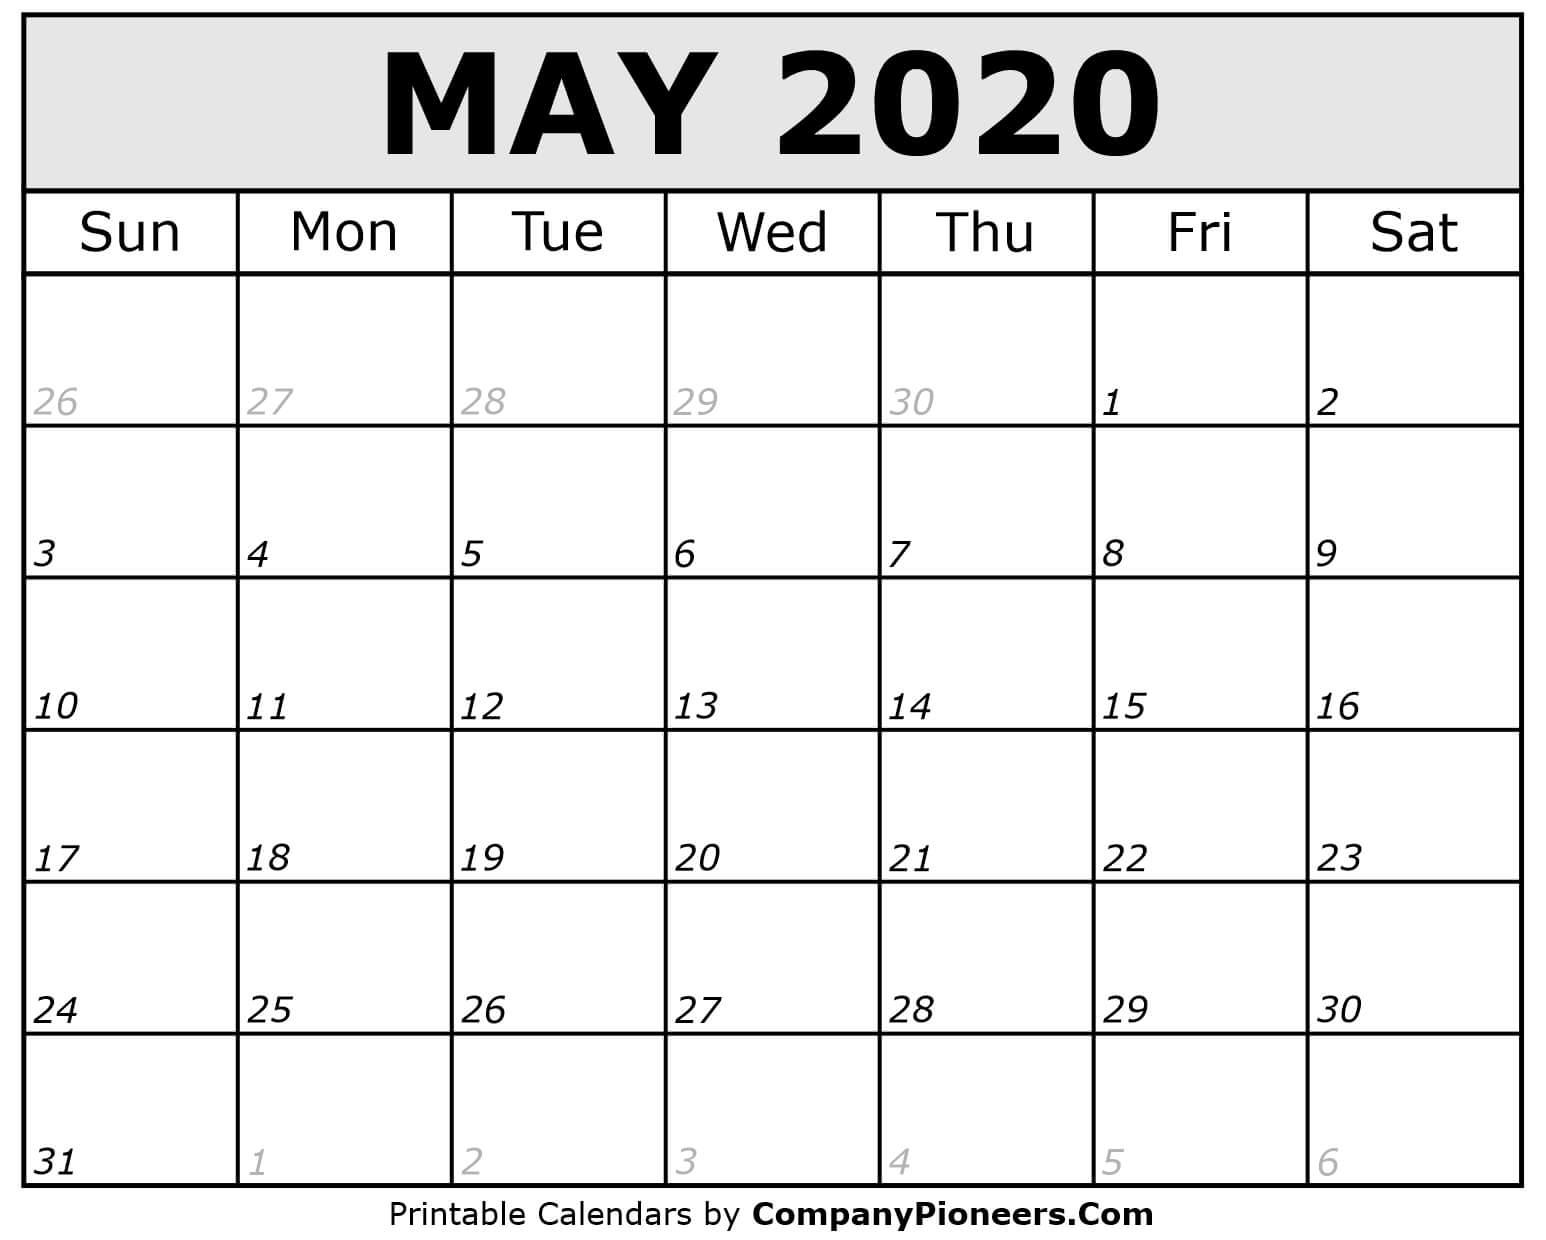 May 2020 Calendar Printable - Printable 2020 Calendars